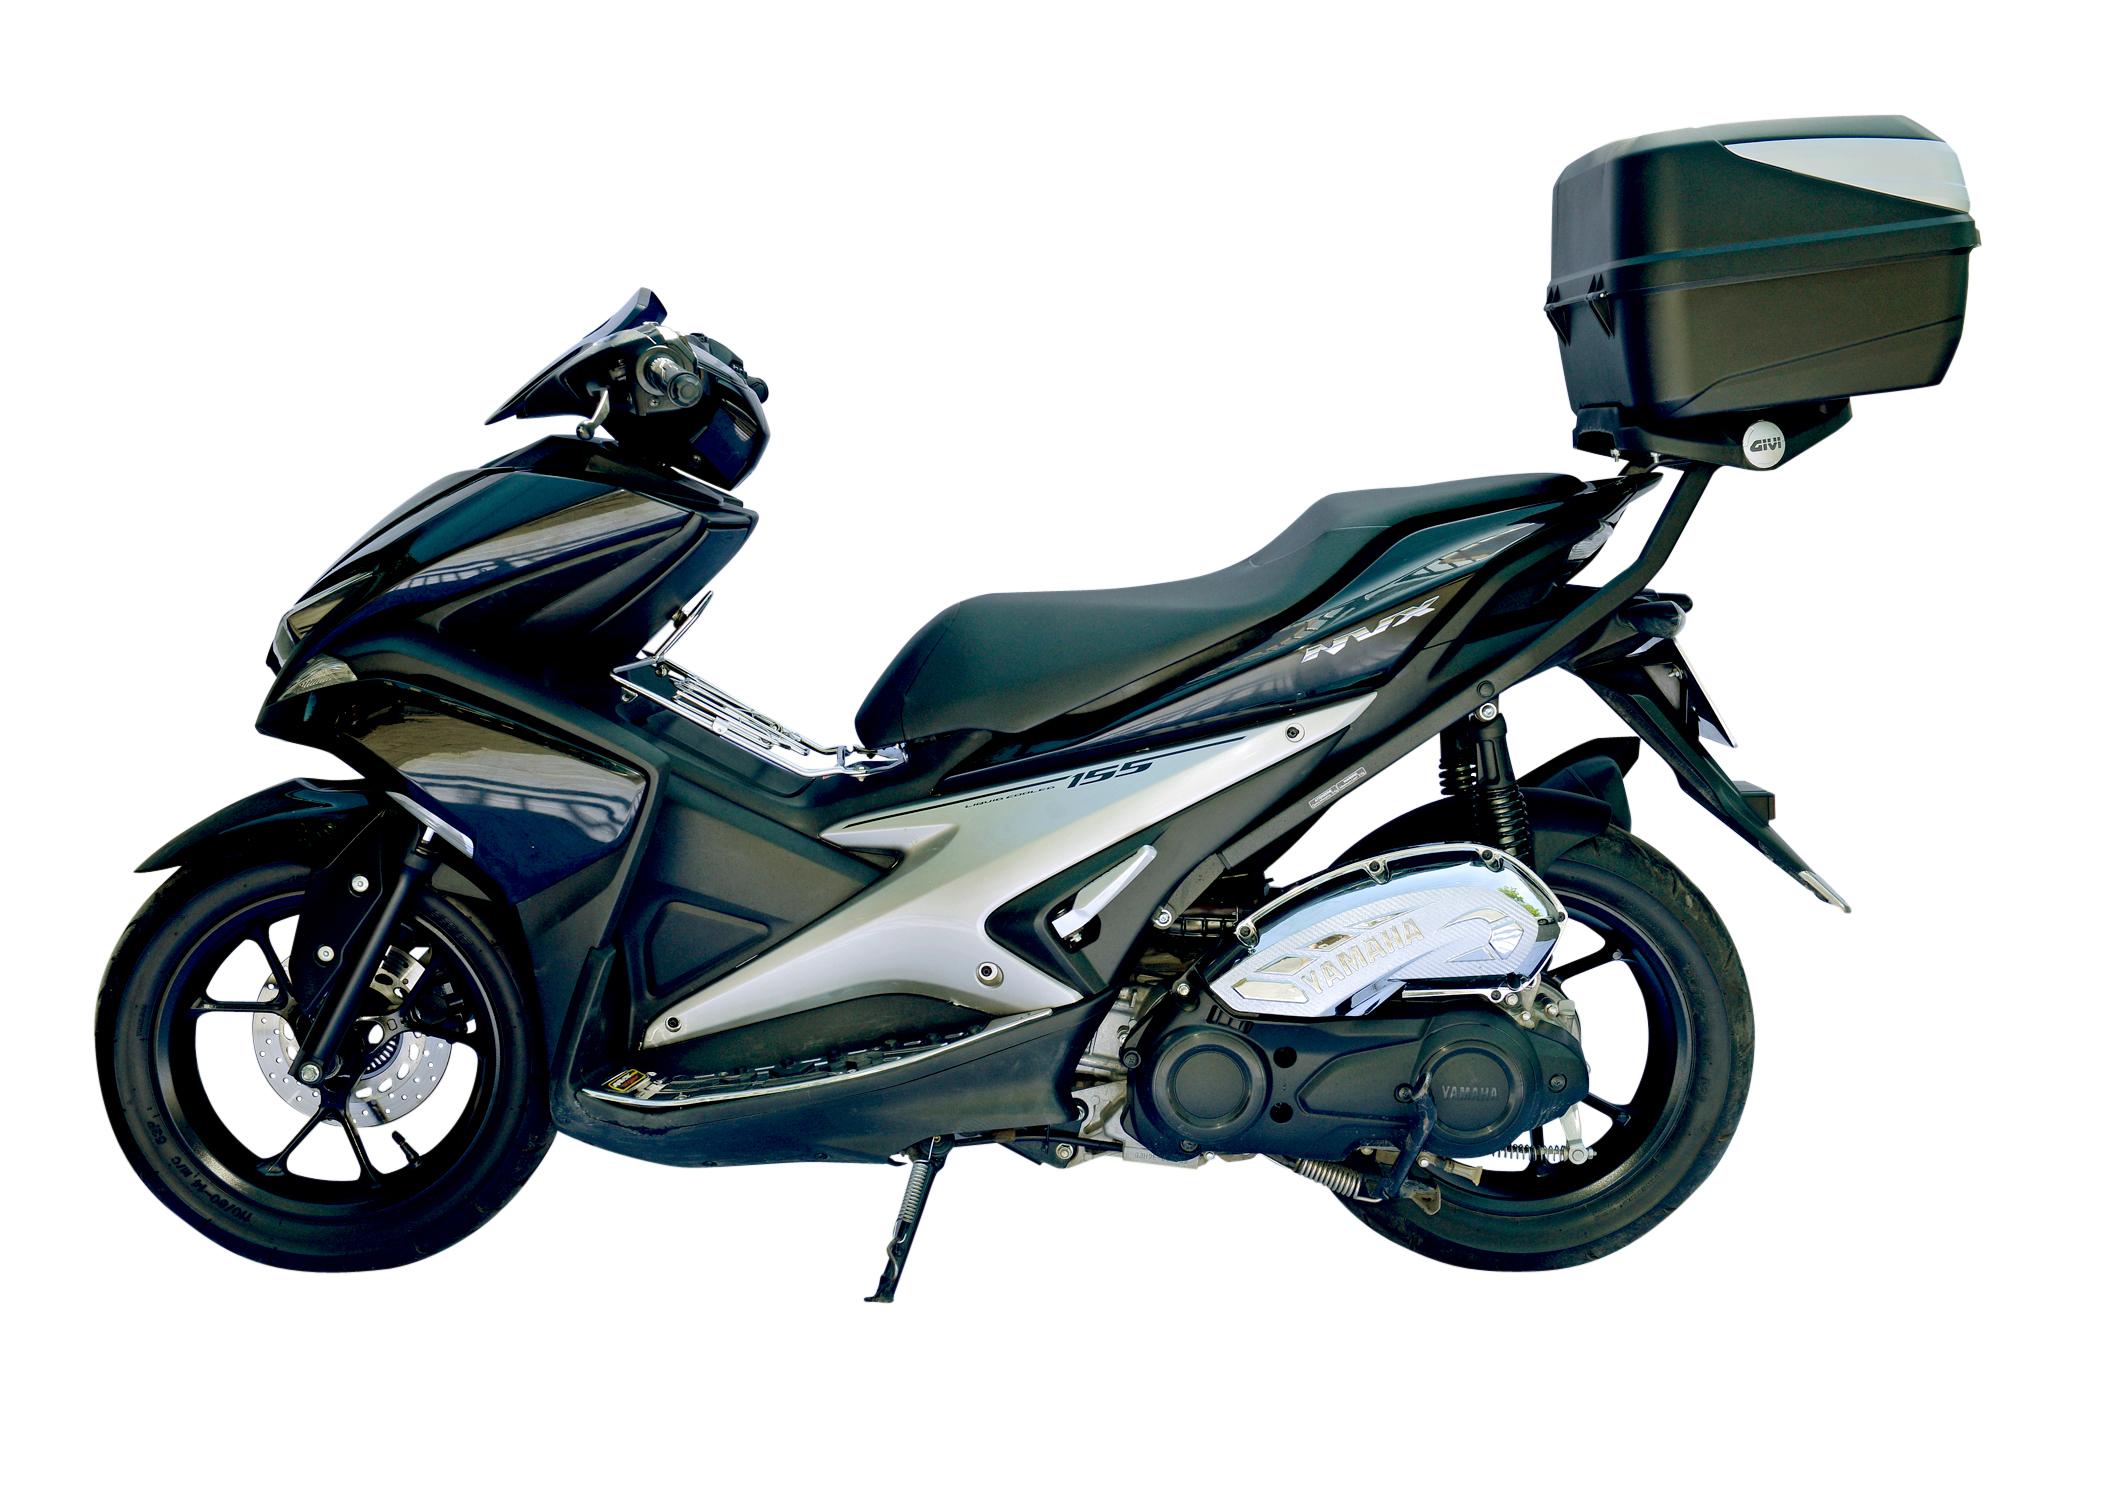 Yamaha NVX 155cc